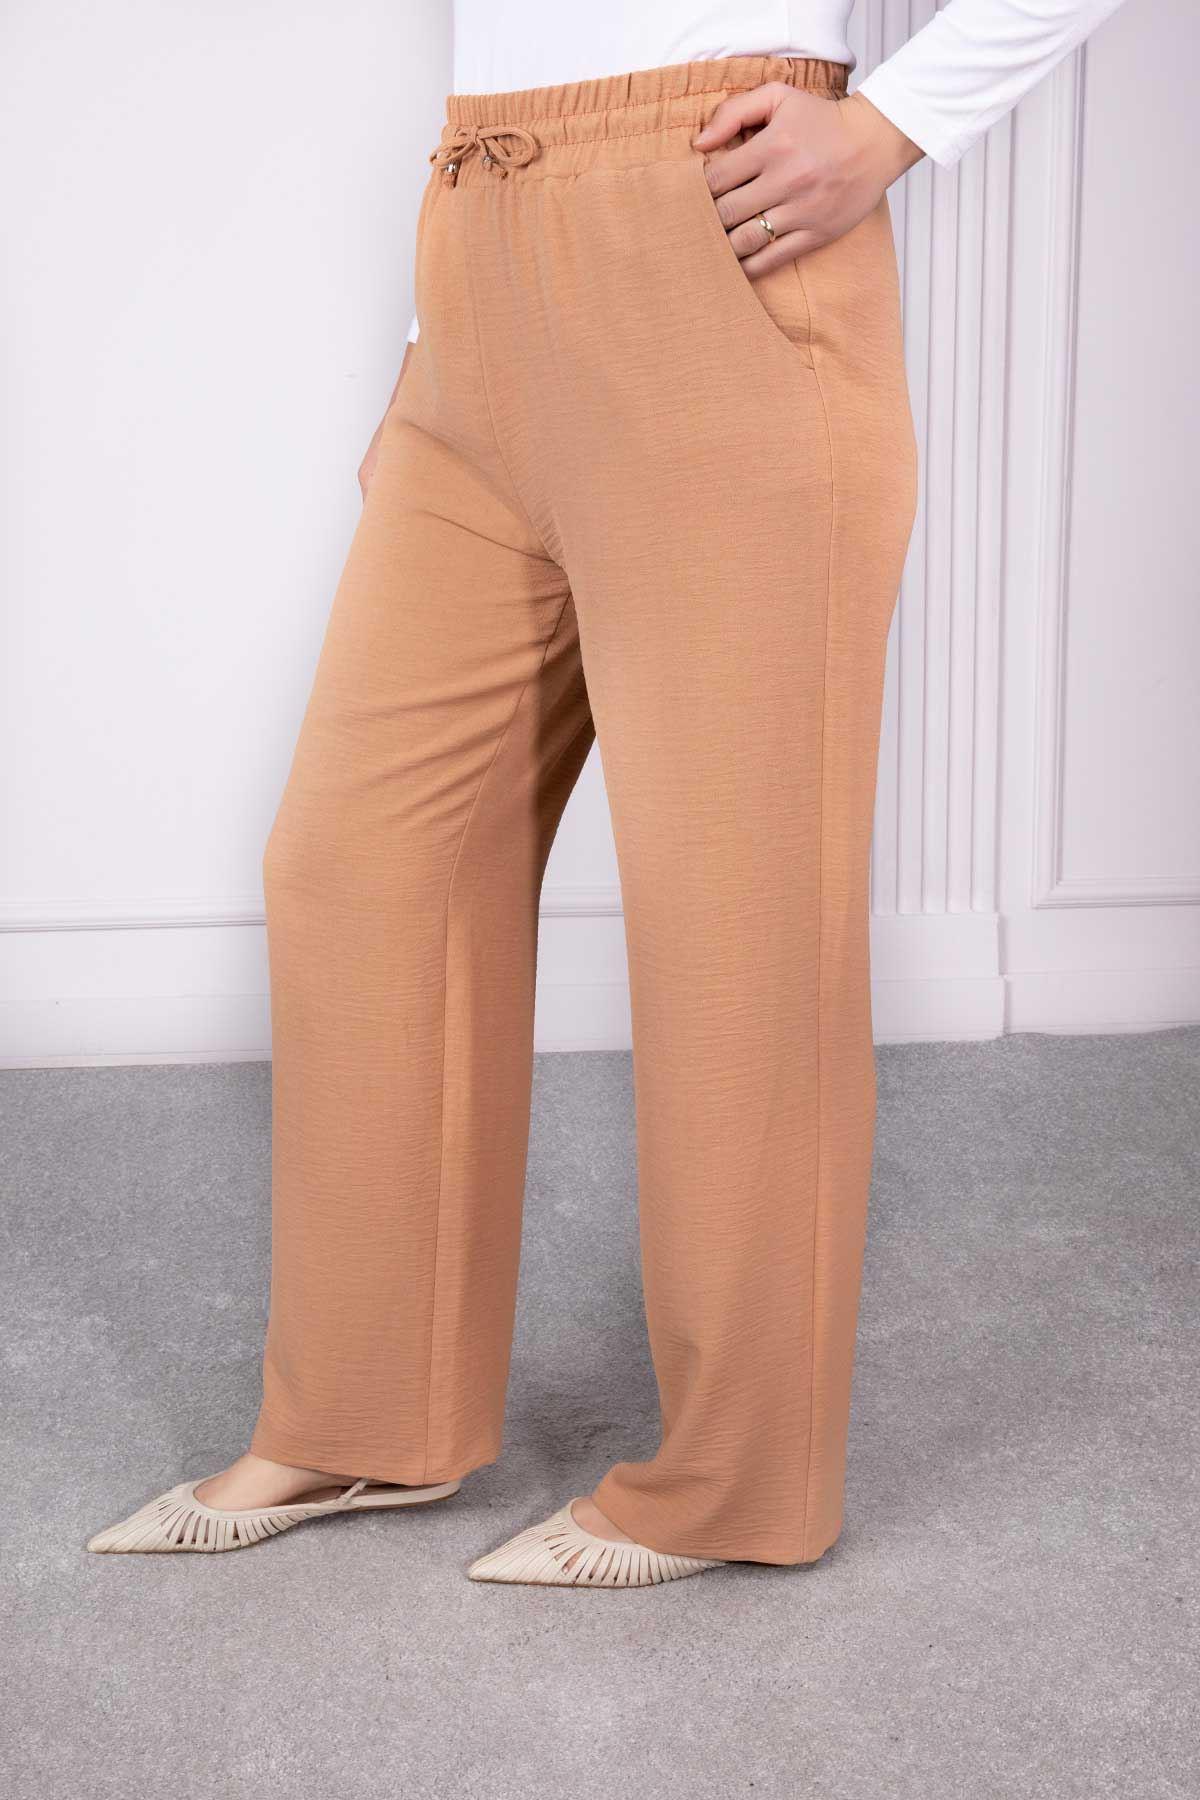 Bel Lastikli Bol Paça Pantolon Camel 2209-32